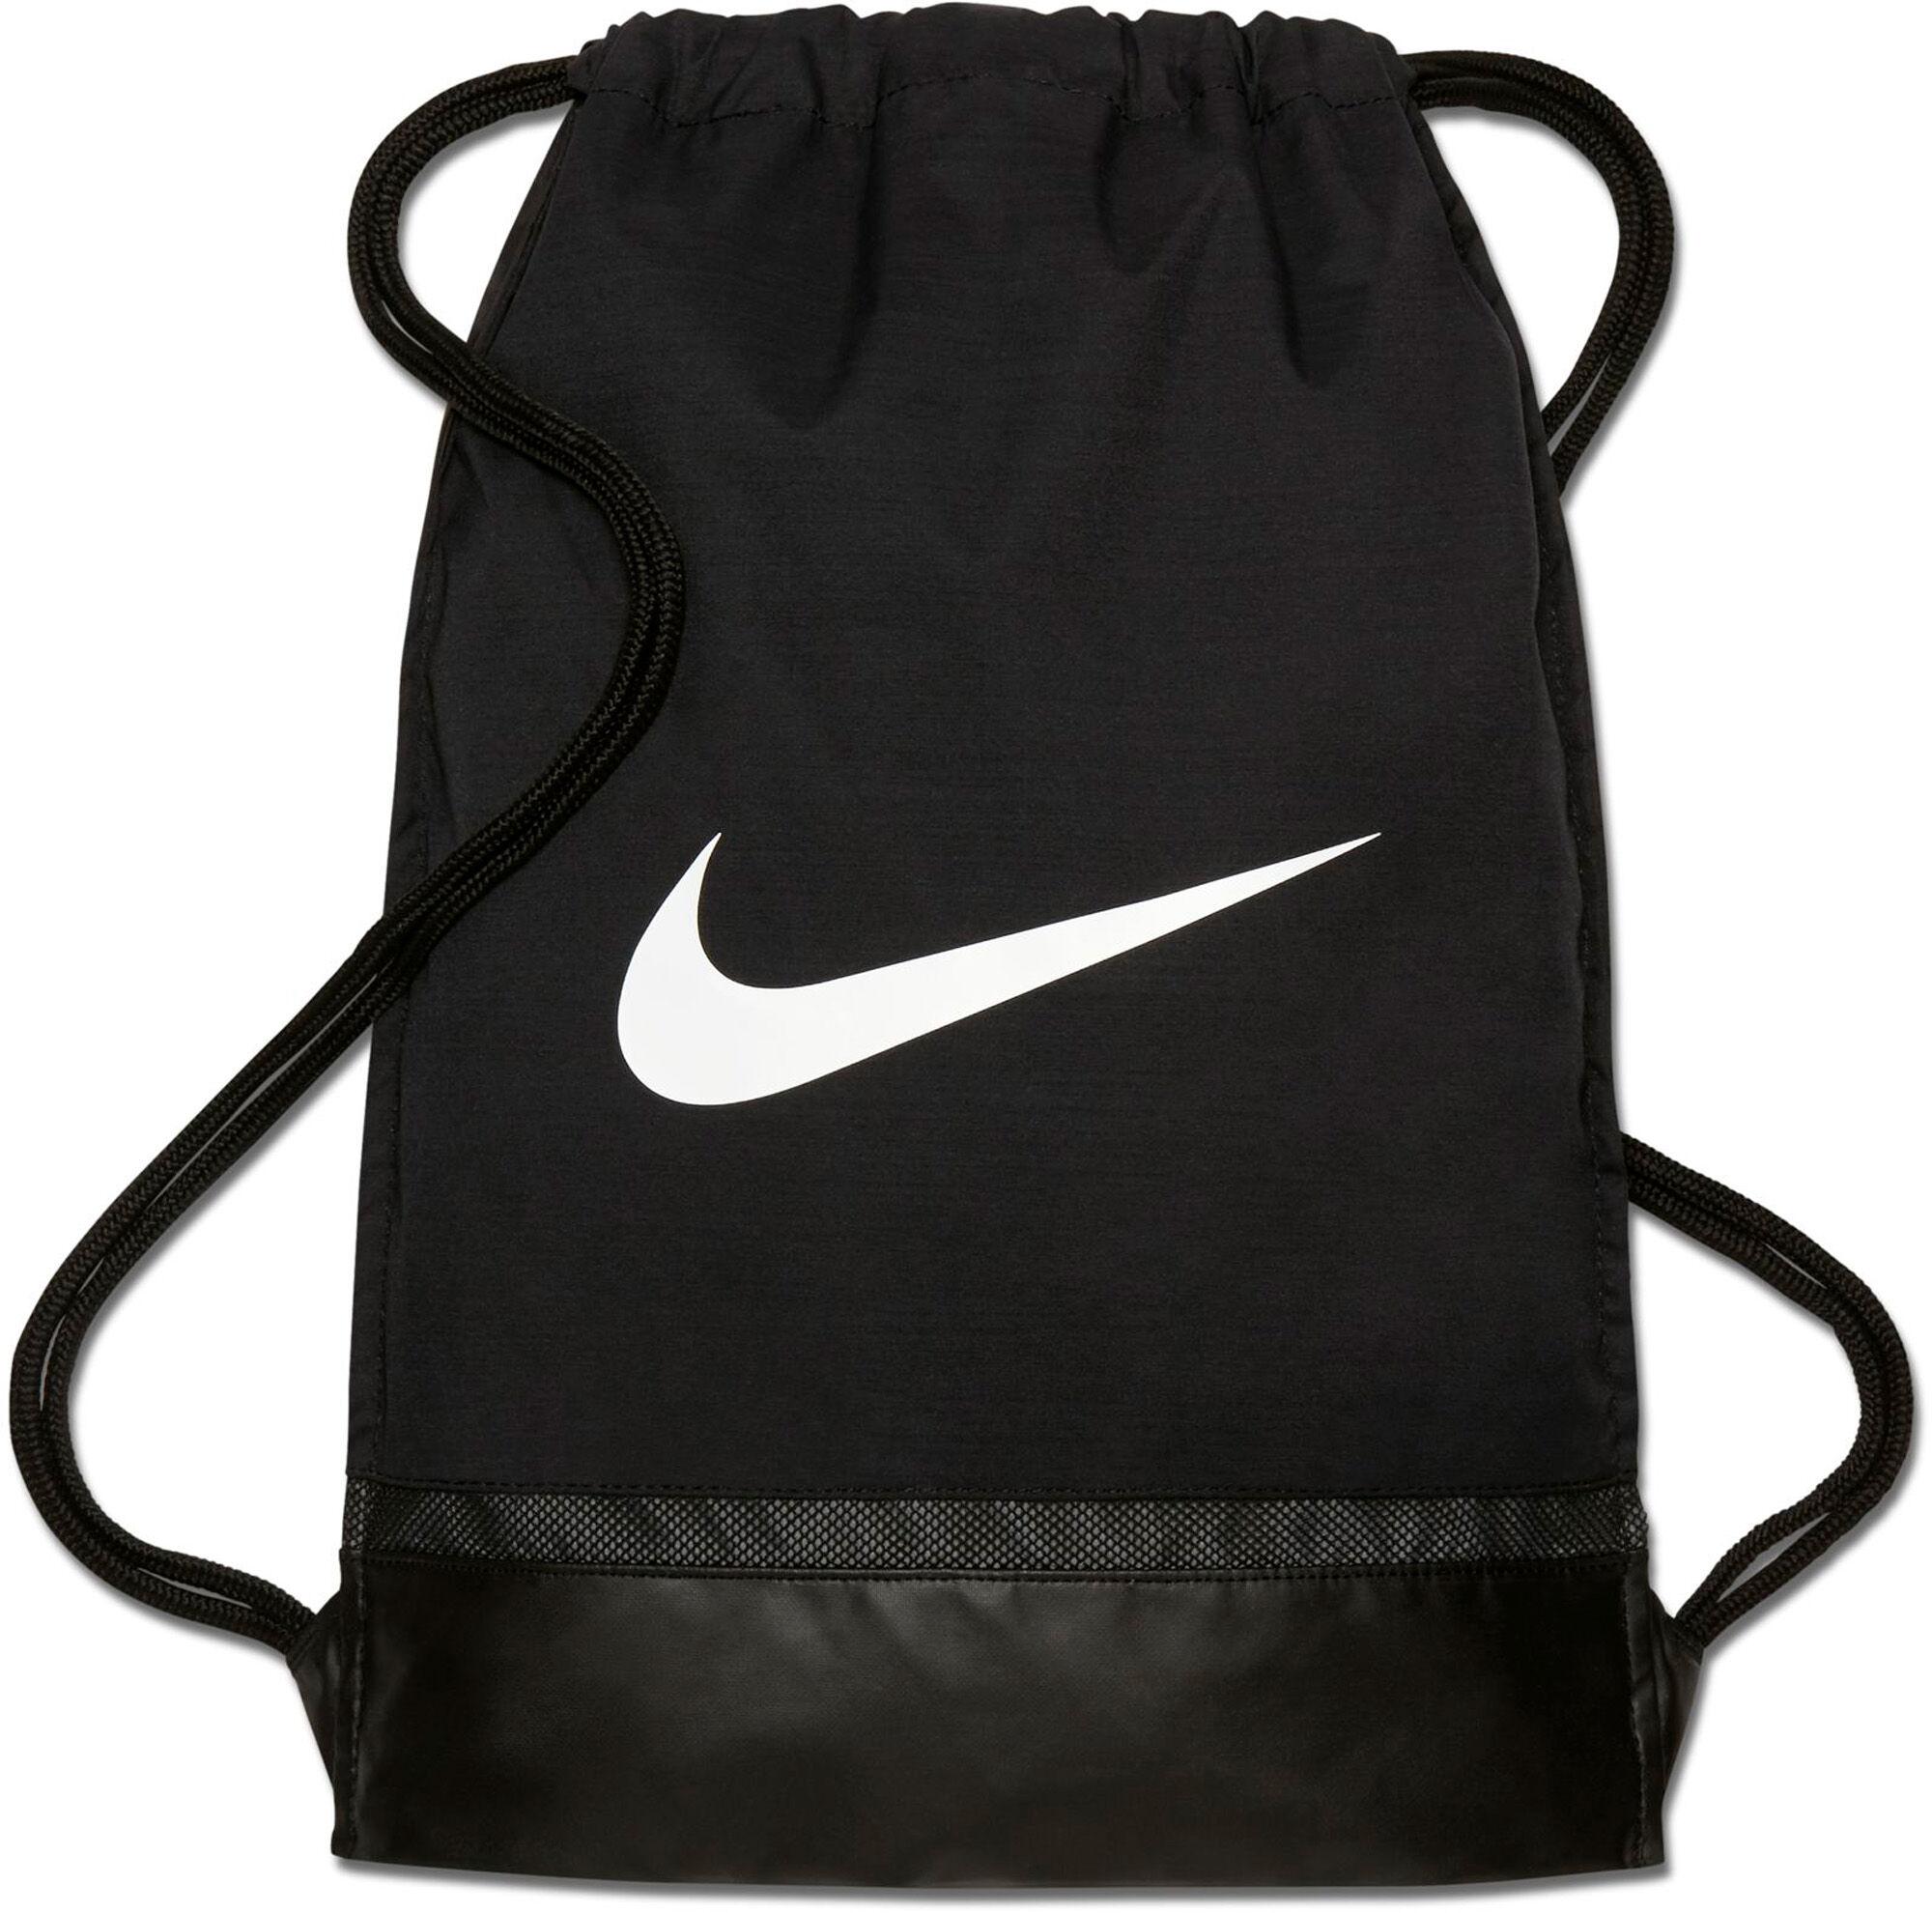 Hvite Nike Air Max Plus Salg Best Pris Nike Casual Sko Gutt